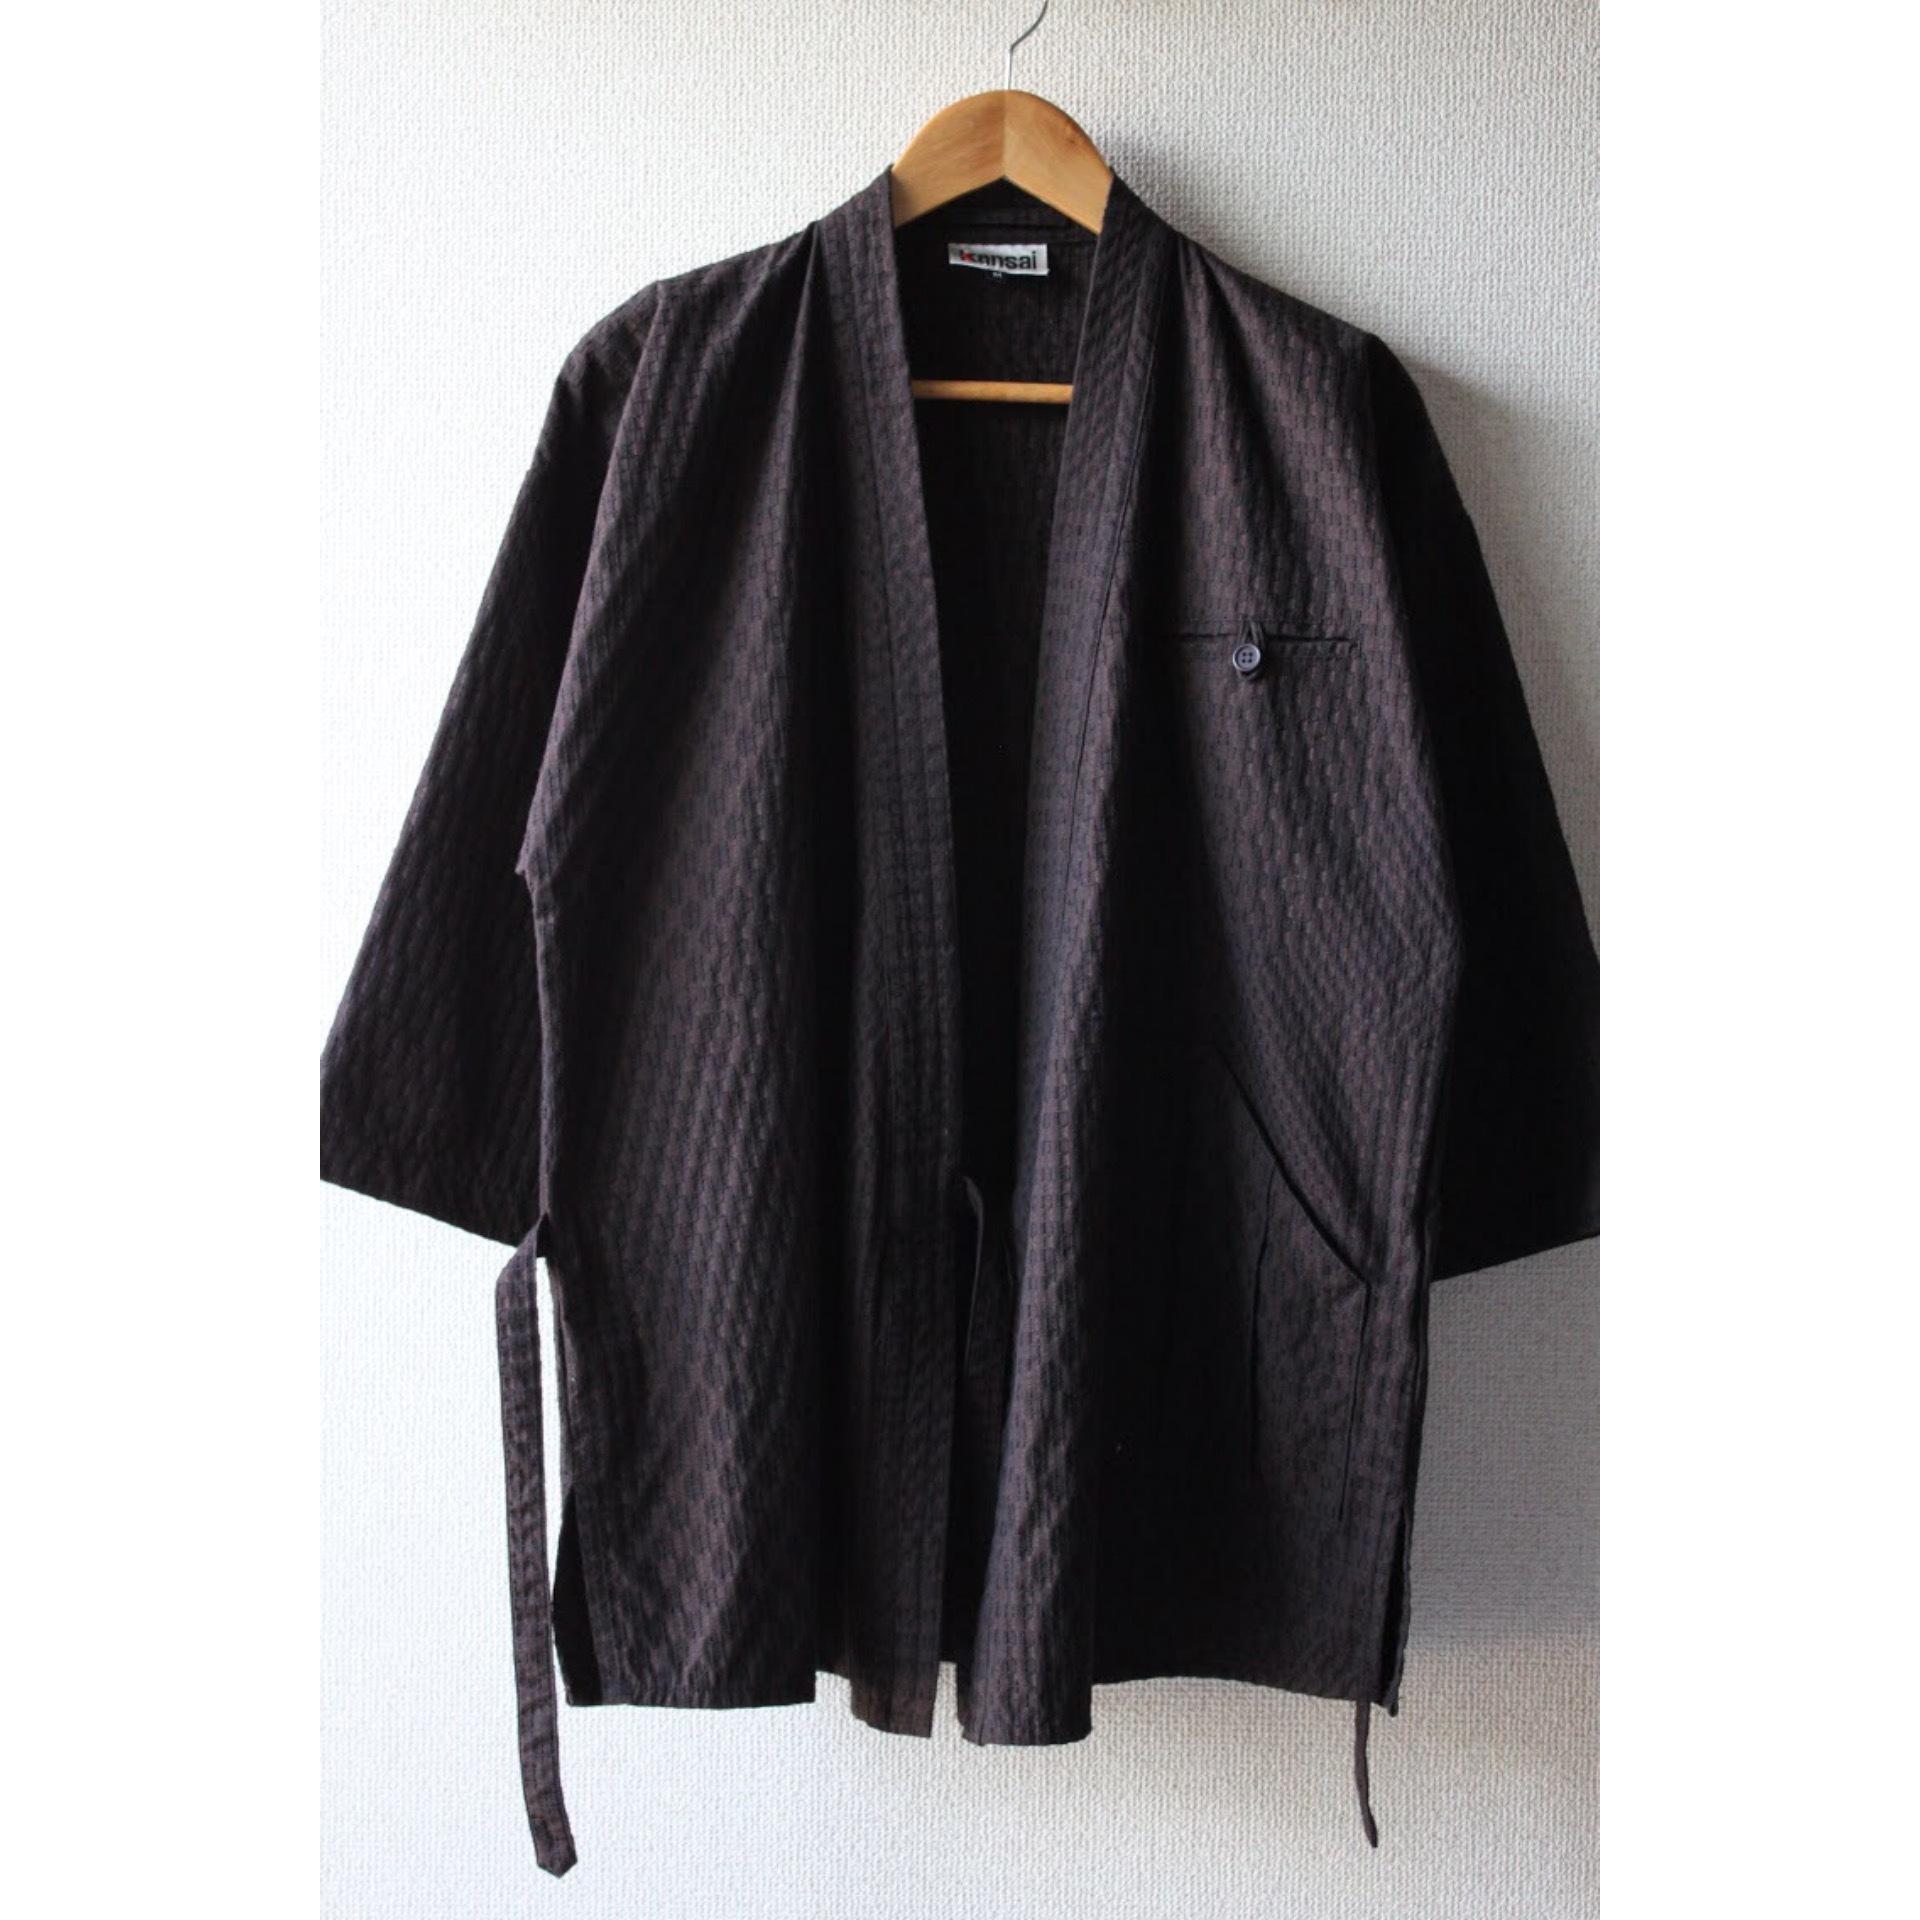 Vintage haori jacket by Kansai